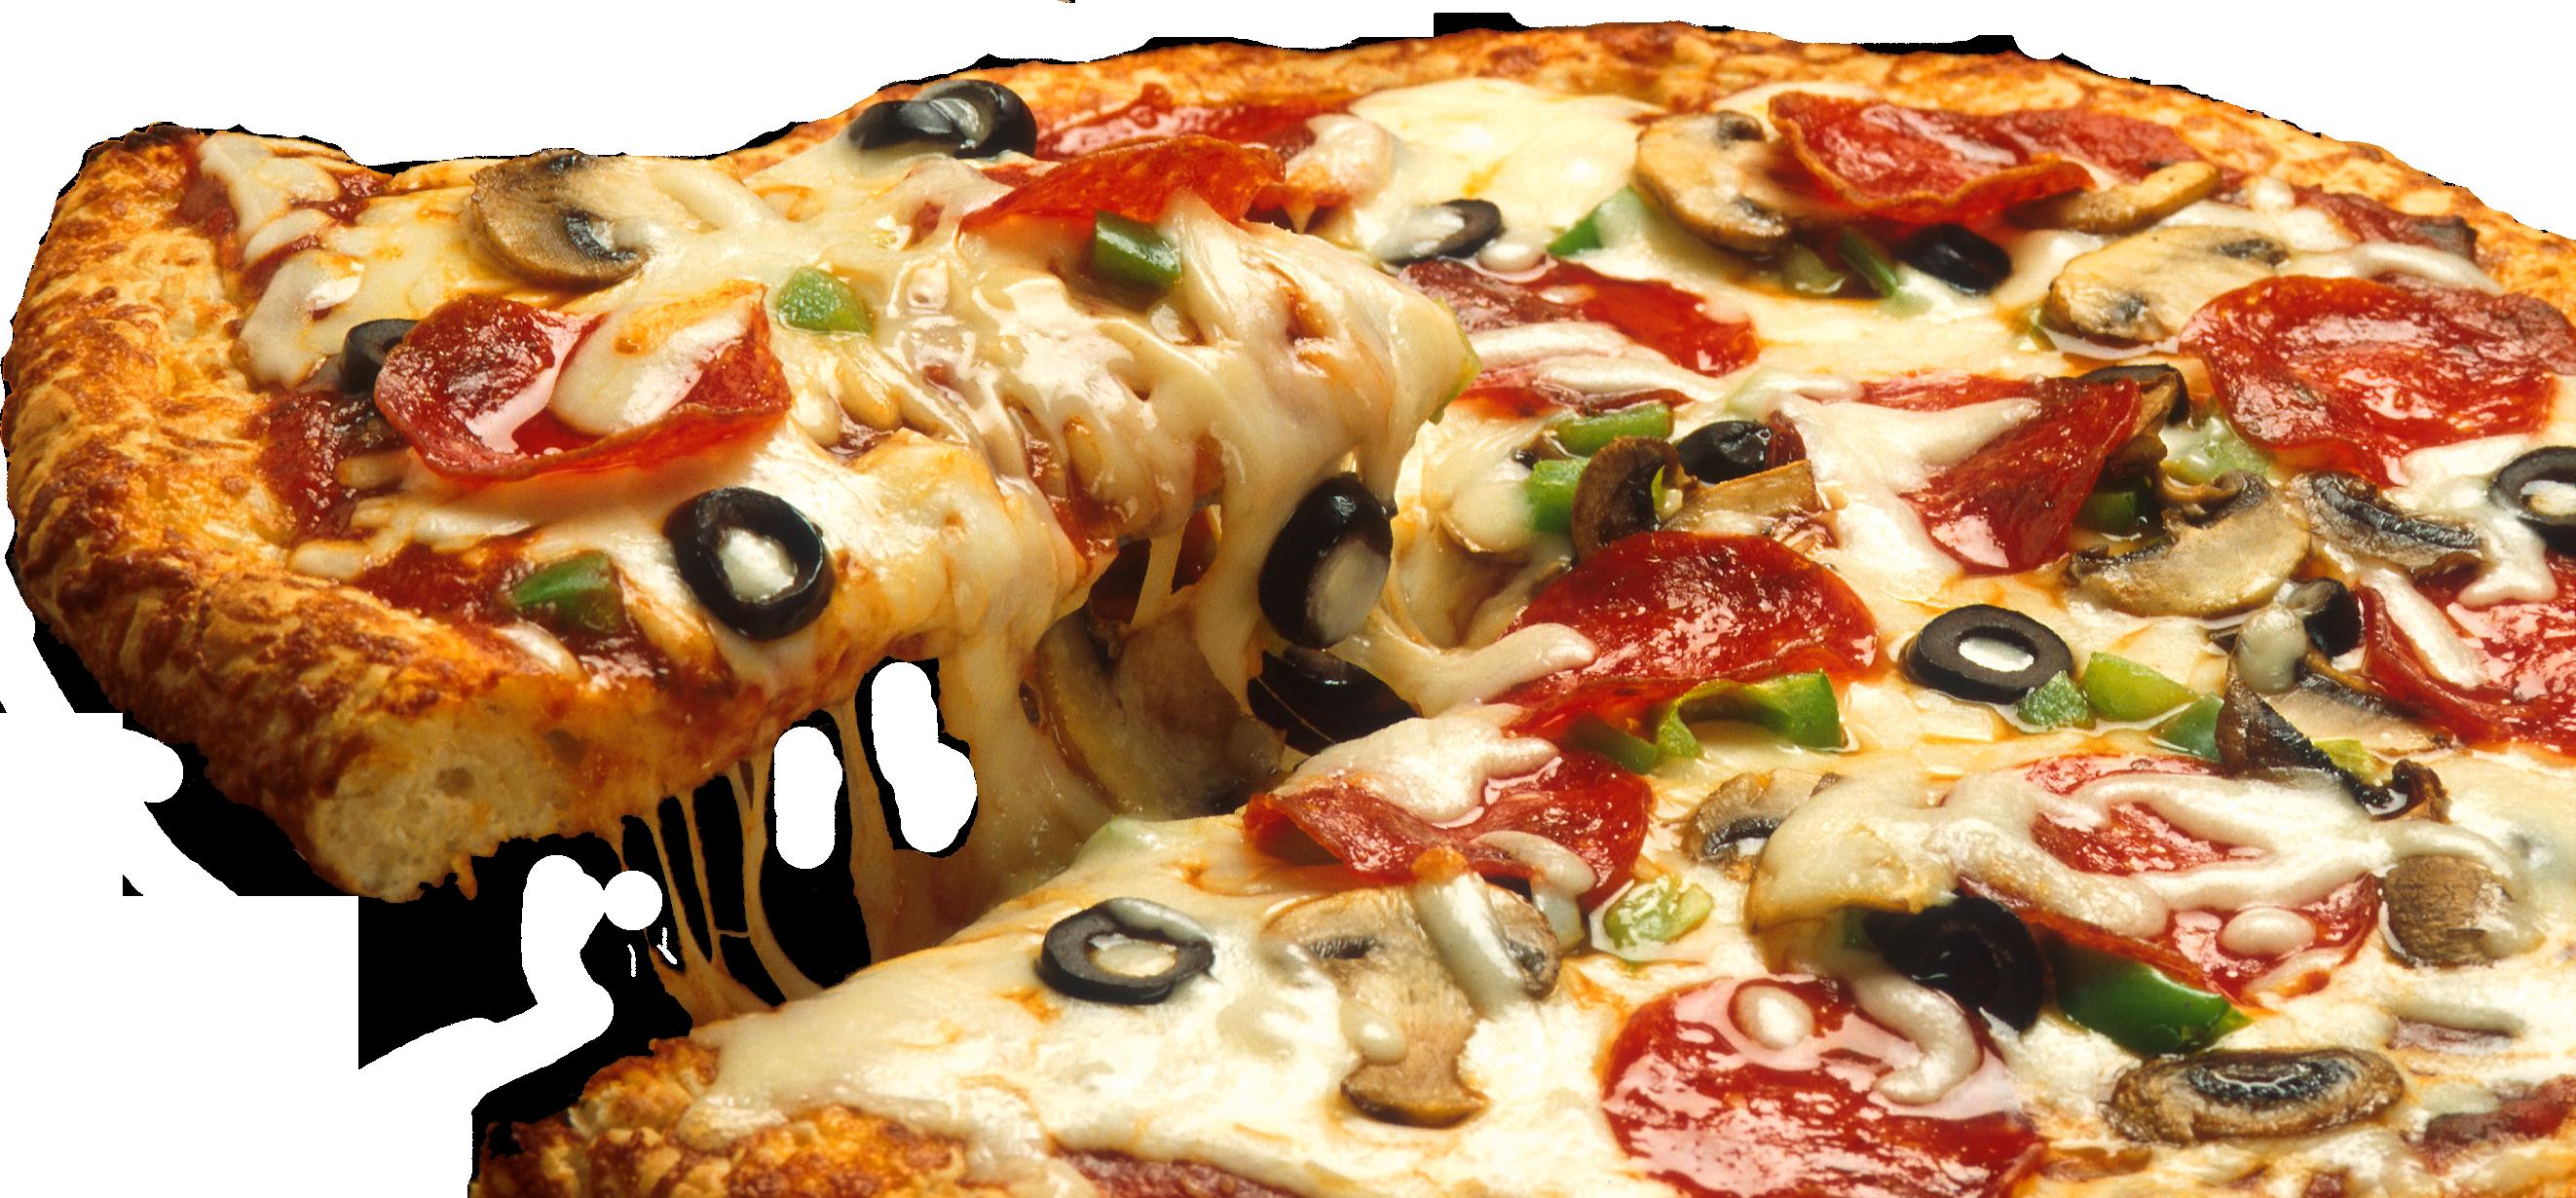 726bbae53f1192dcf7d5_pizza2.jpg